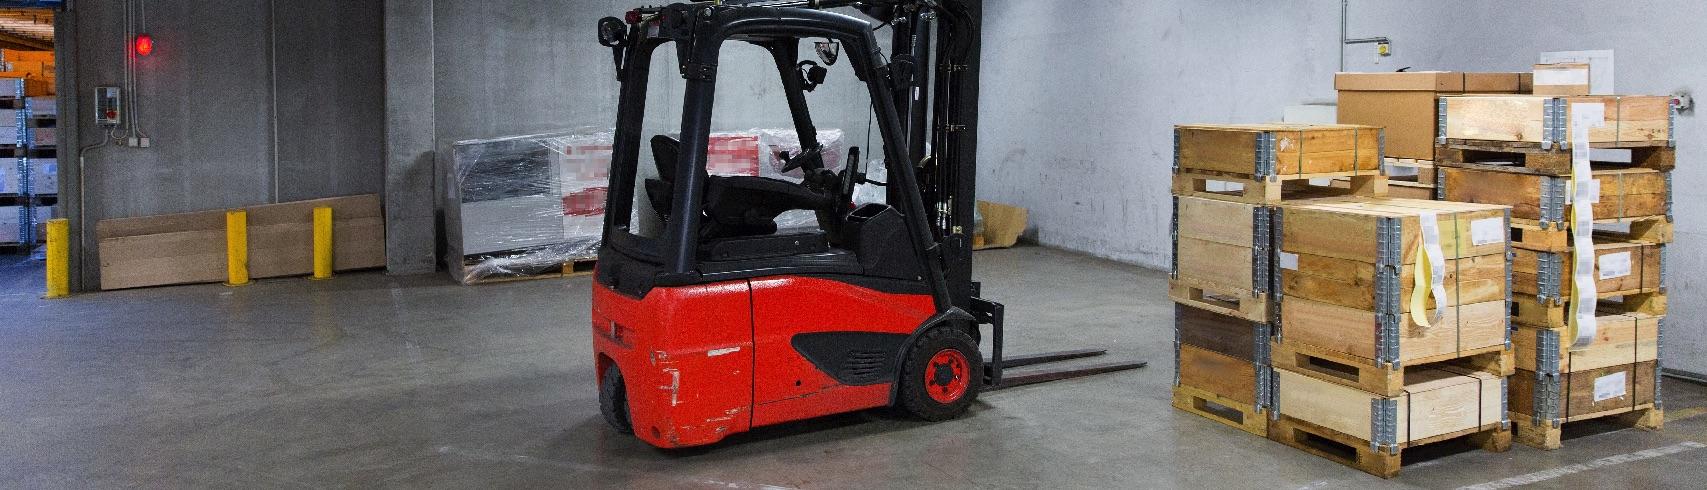 Forklift Rental Washington D.C. - Tobly Equipment Rental